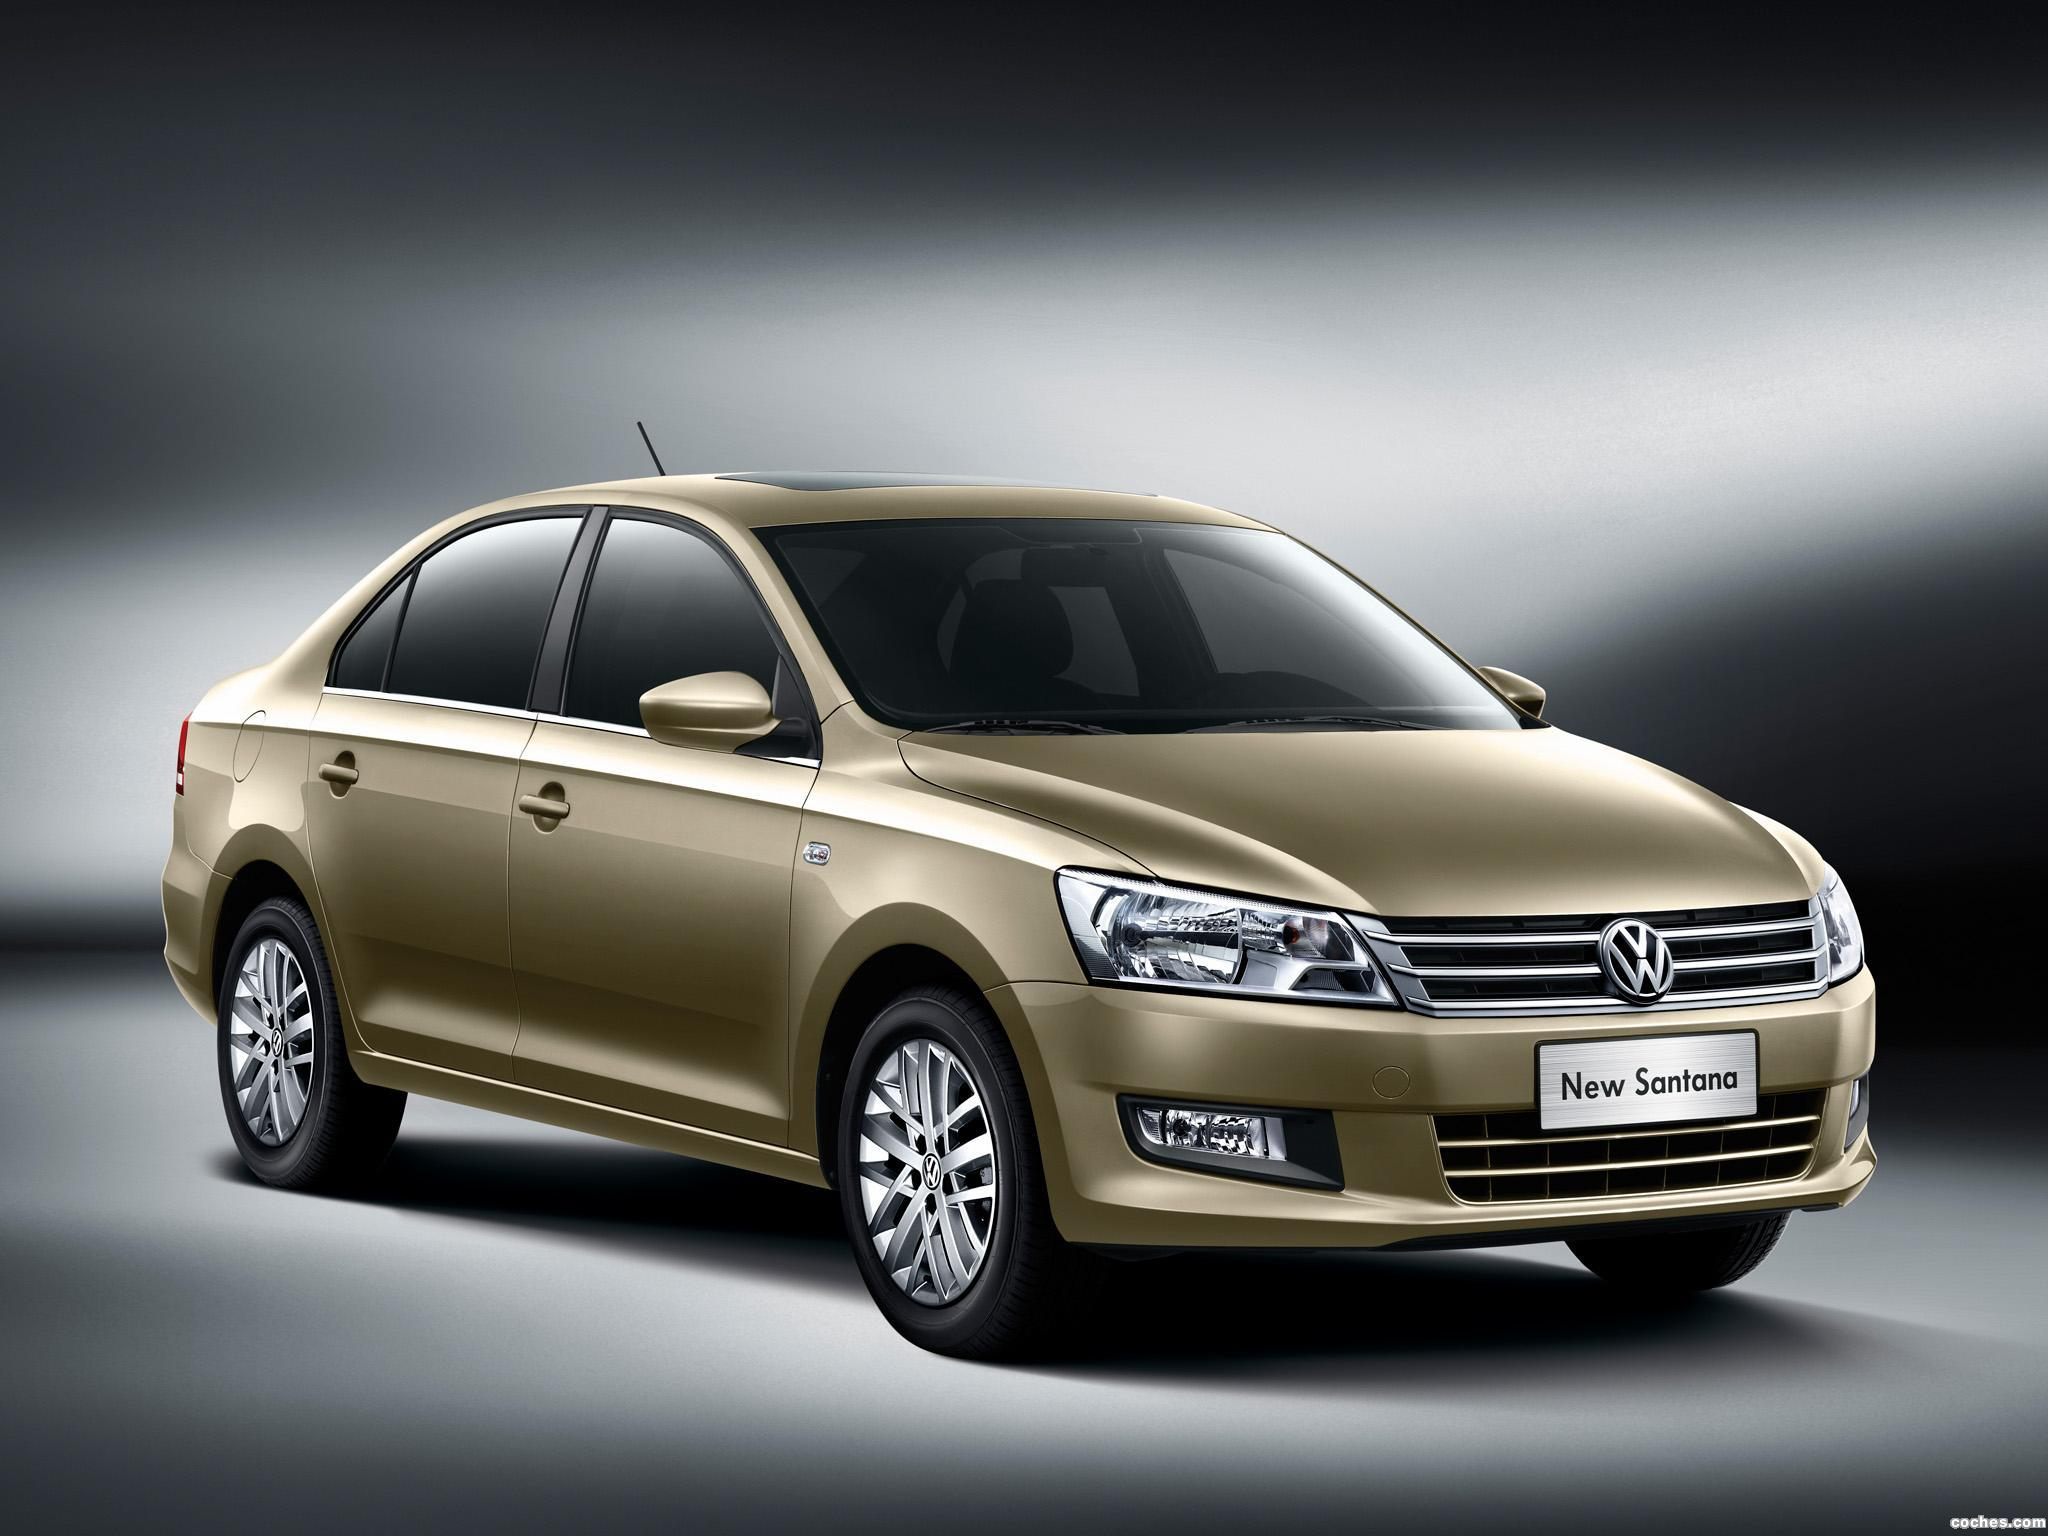 Foto 0 de Volkswagen Santana China 2012